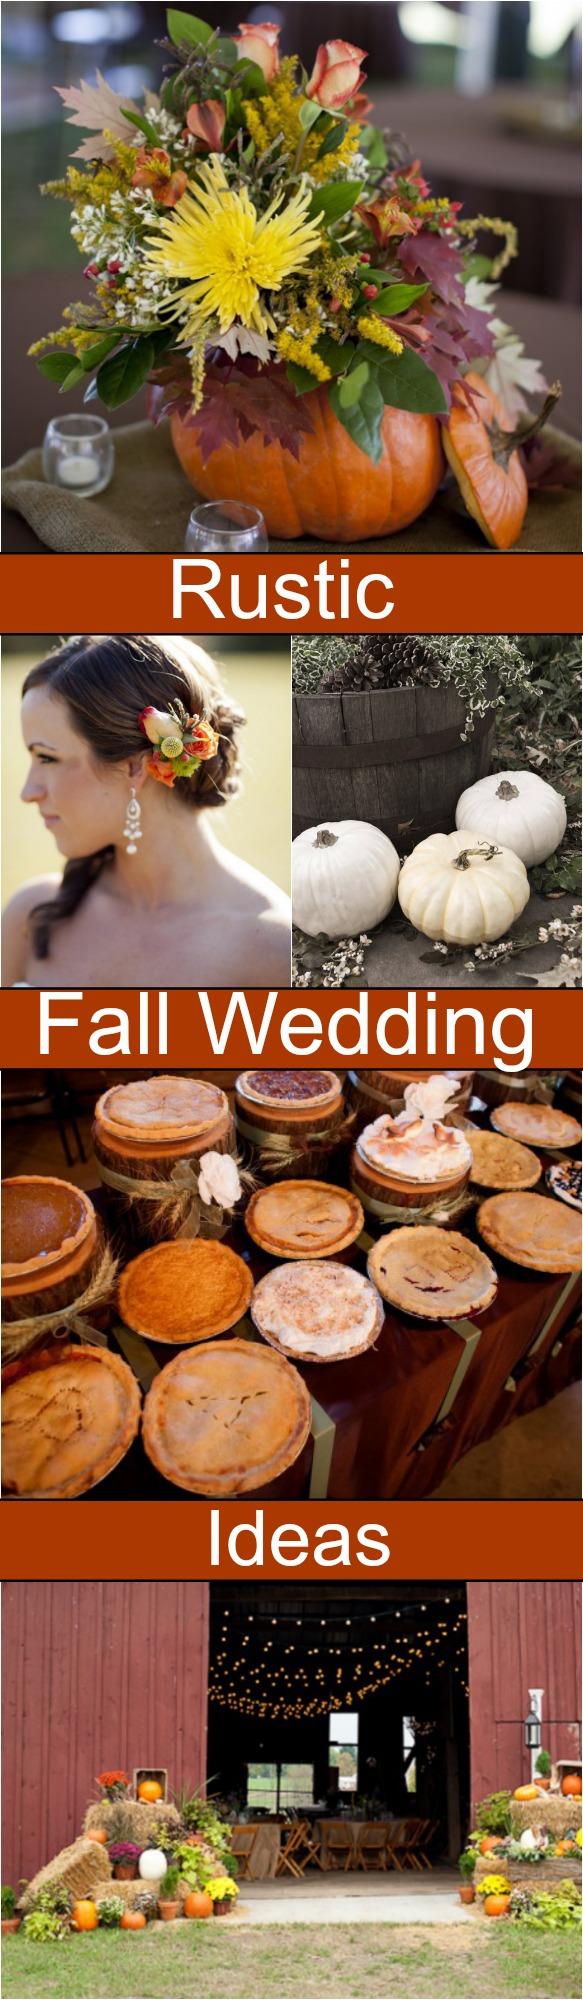 Fall Love Wedding Decorations